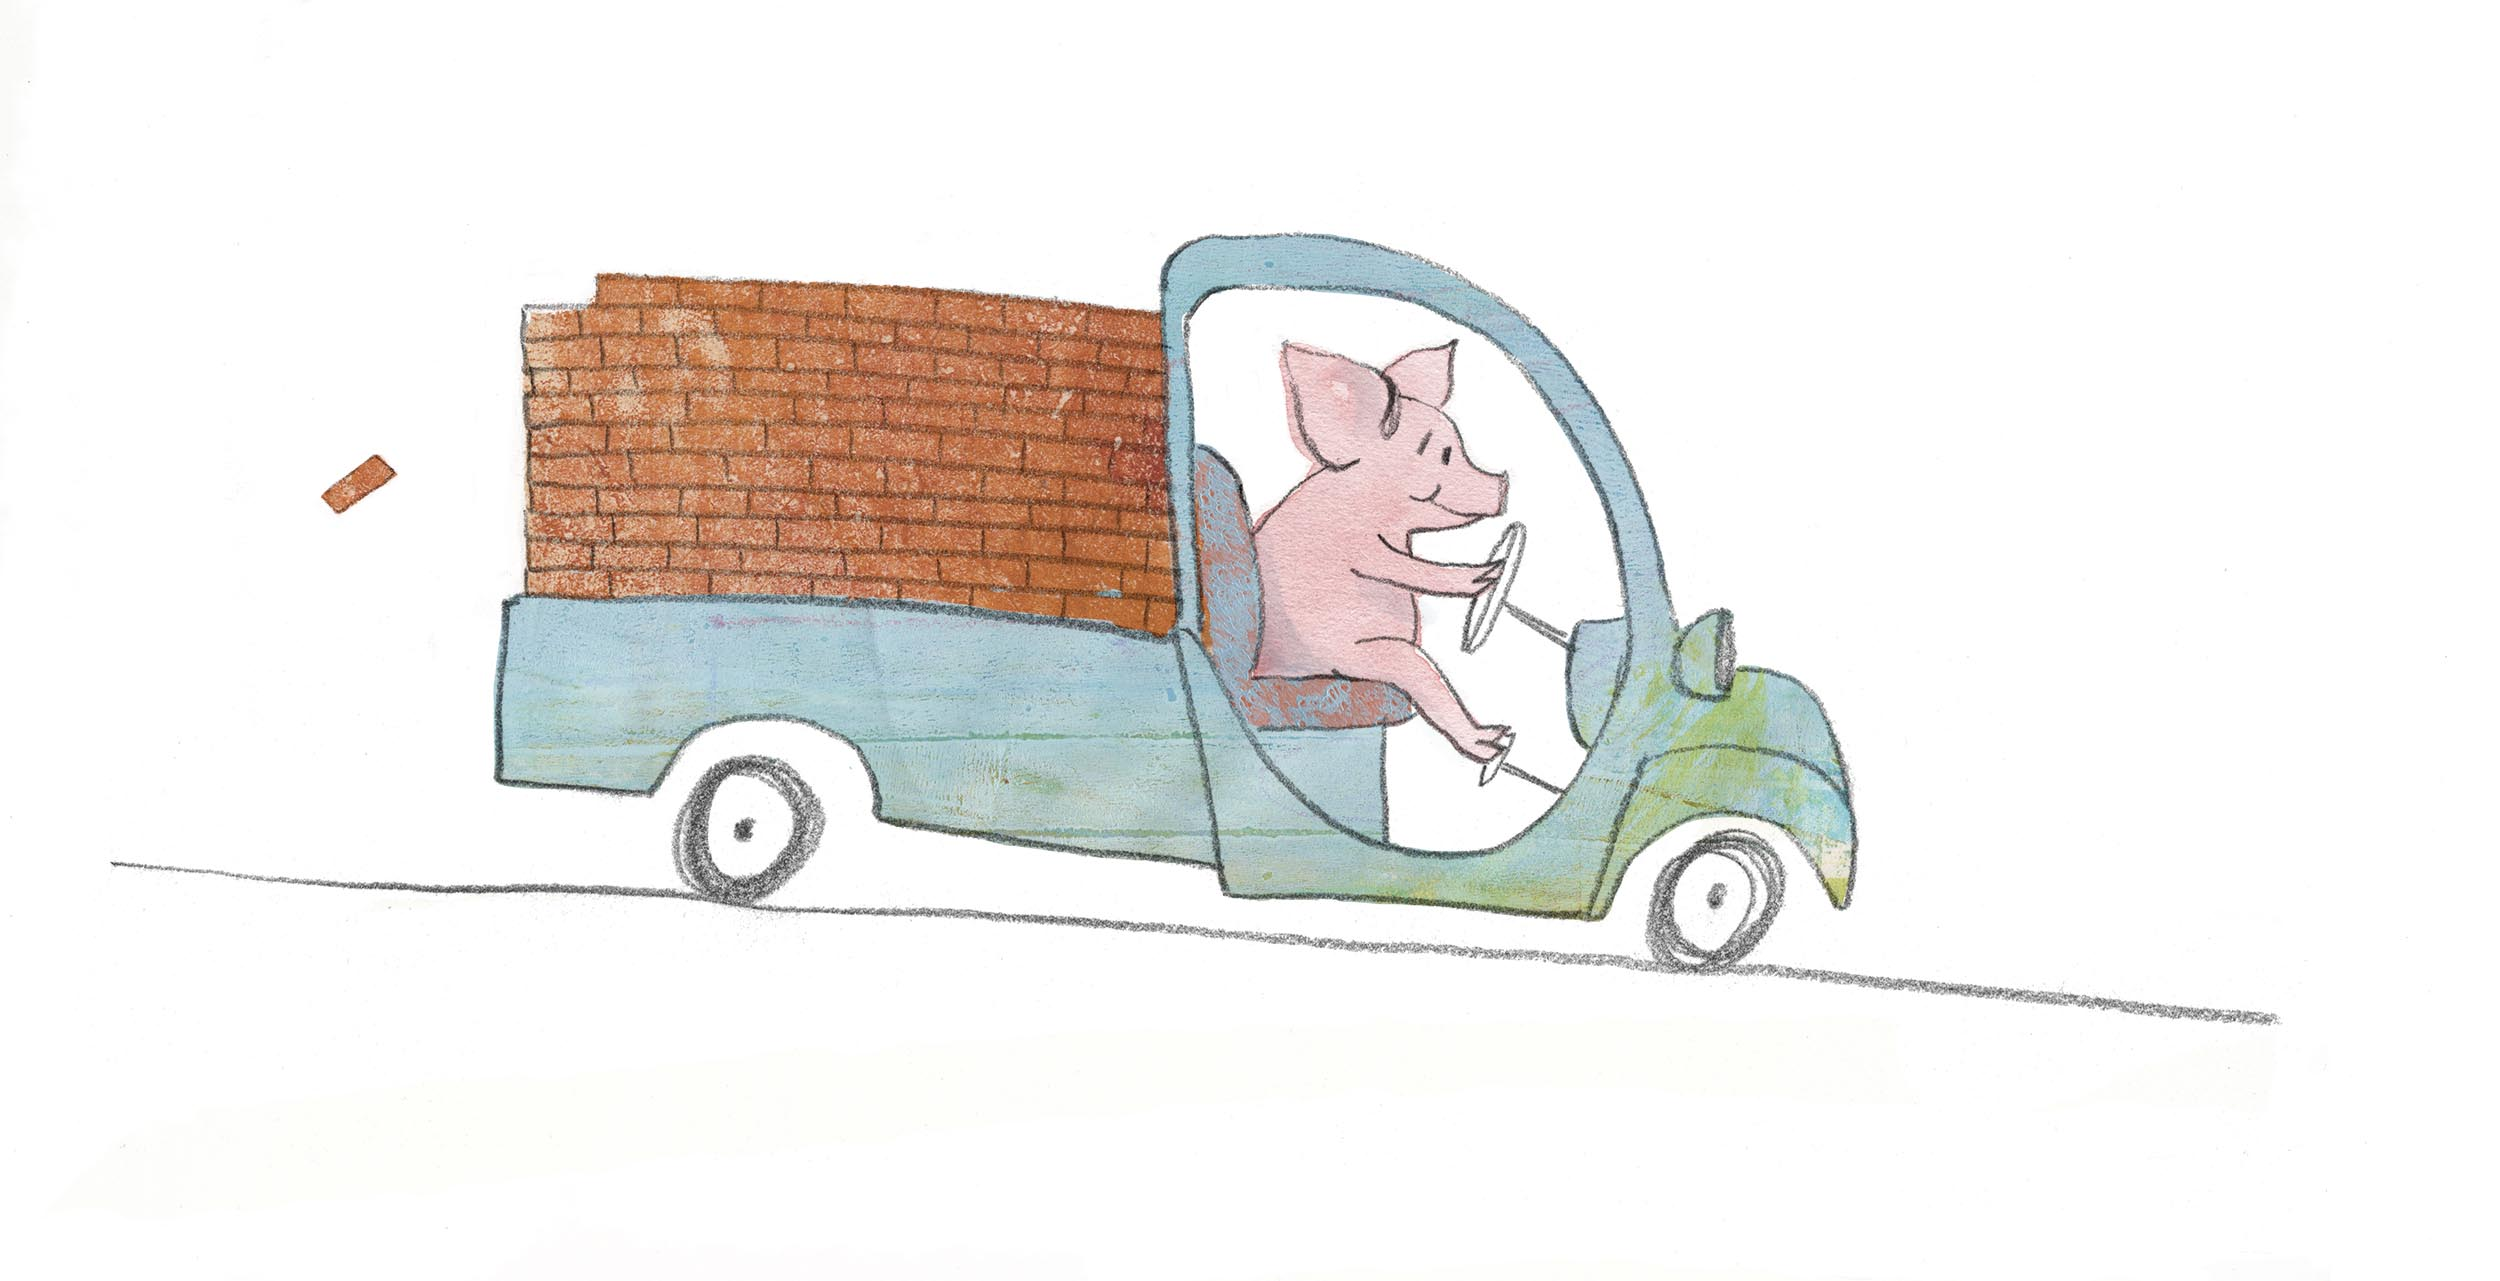 pig with gelli print bricks 10-16-2017.jpg